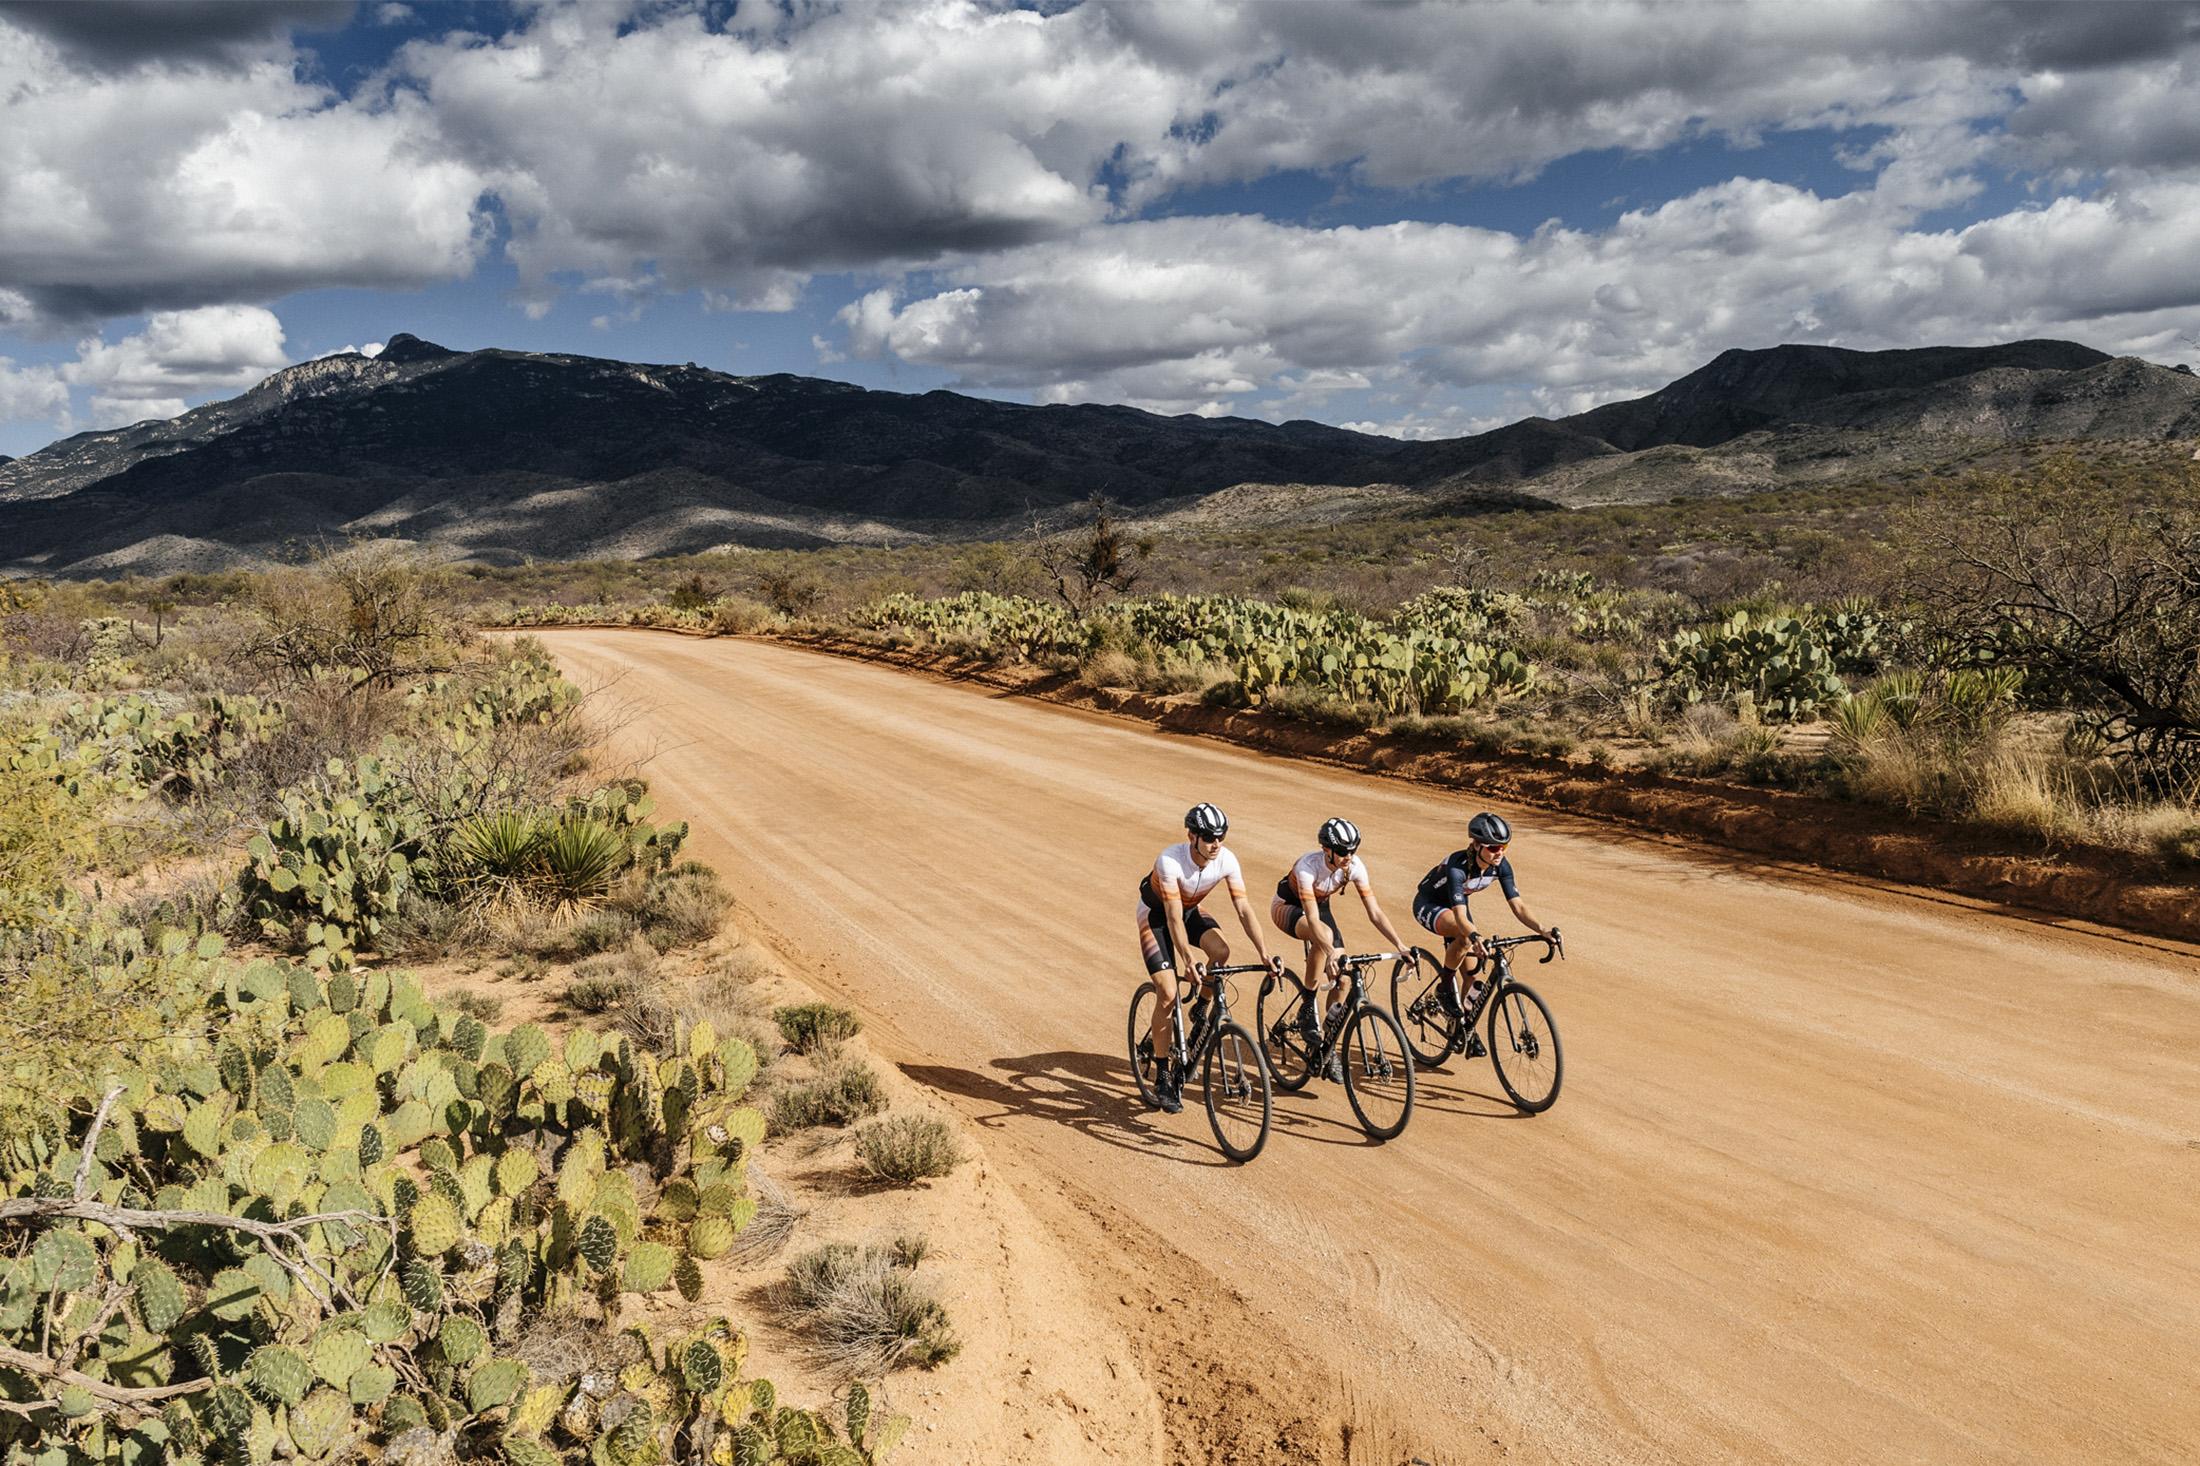 Walmart Says Its High-End Viathon Bikes Will Grow Cycling